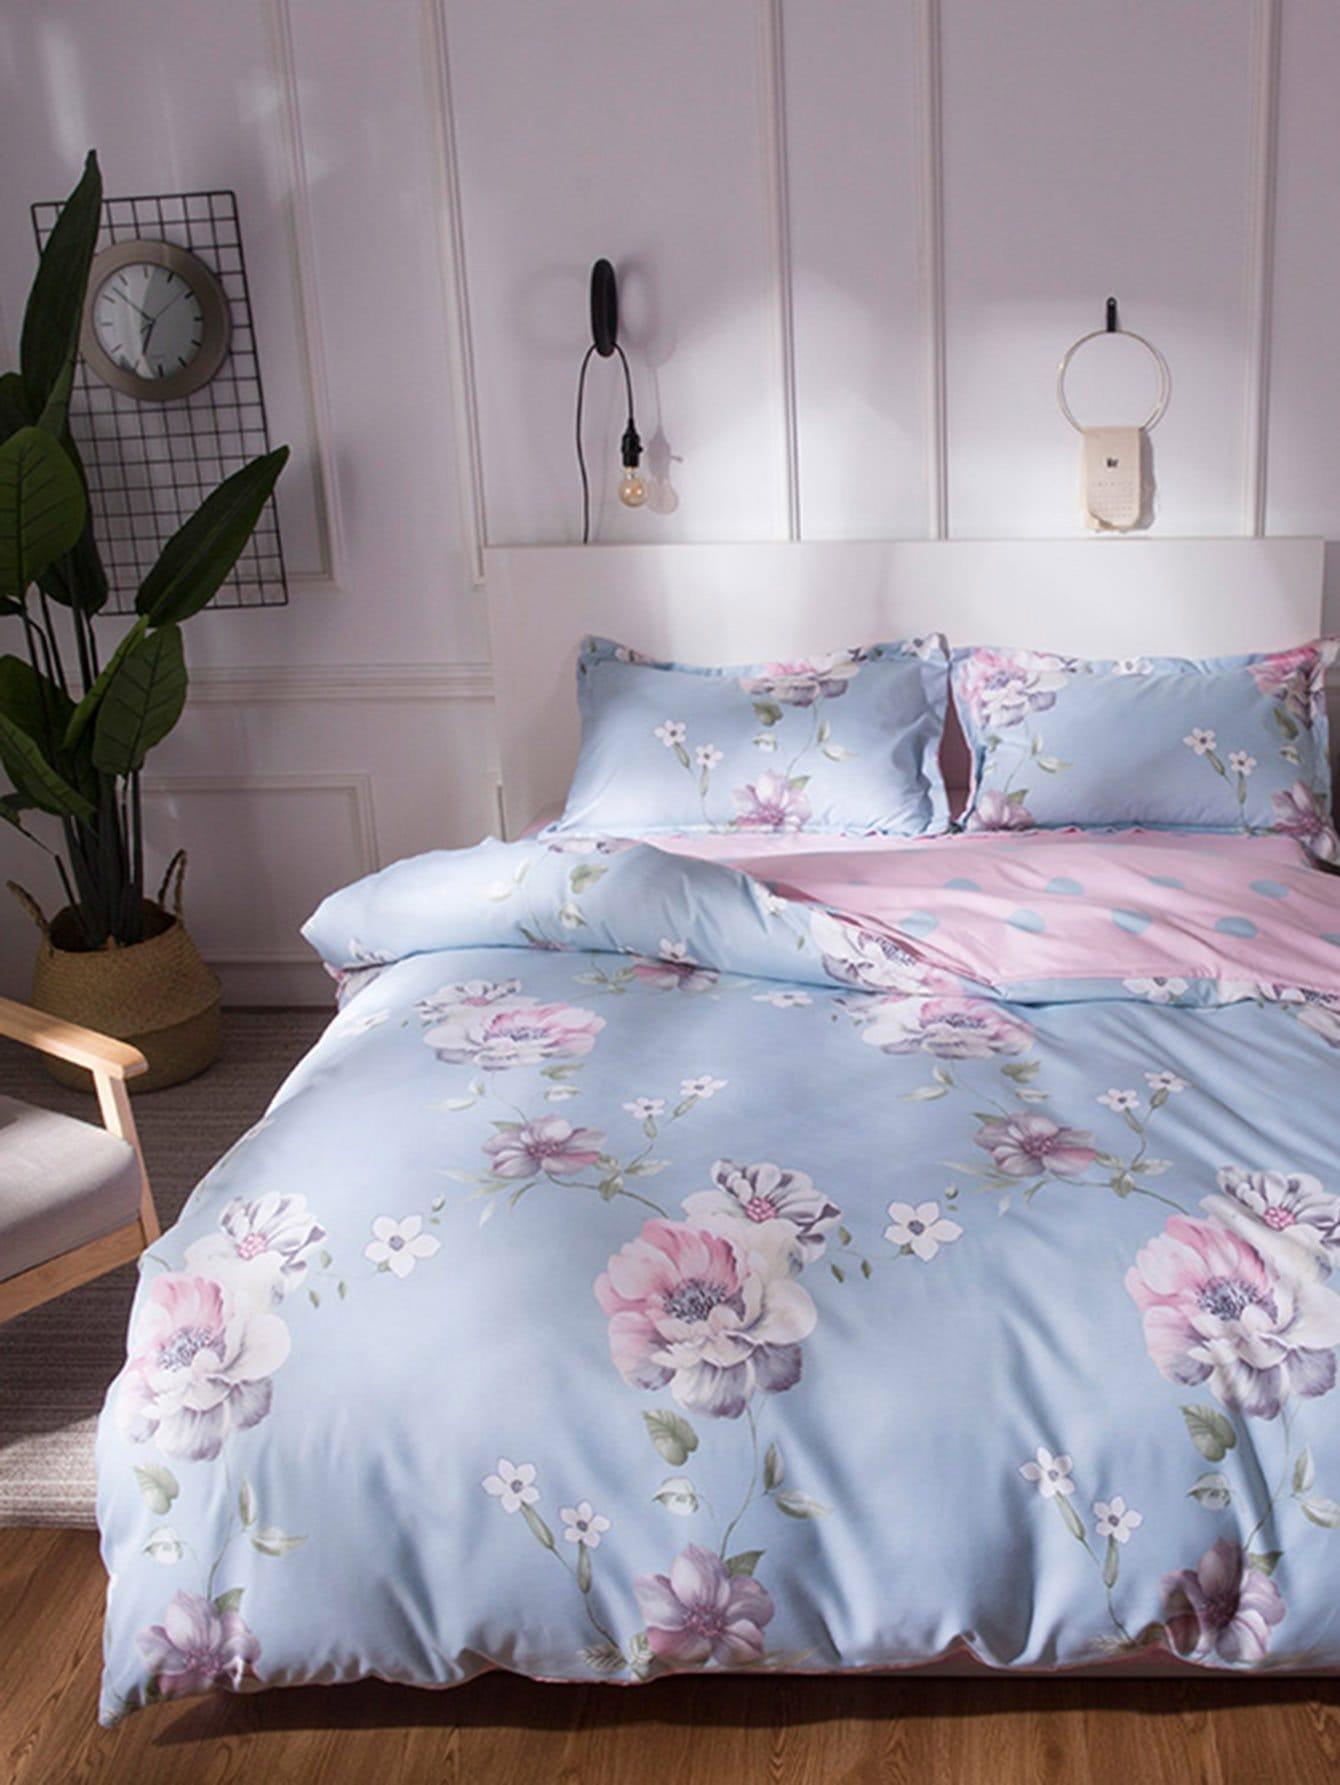 Floral Bedding Set 1 5m 4pcs floral print bedding set